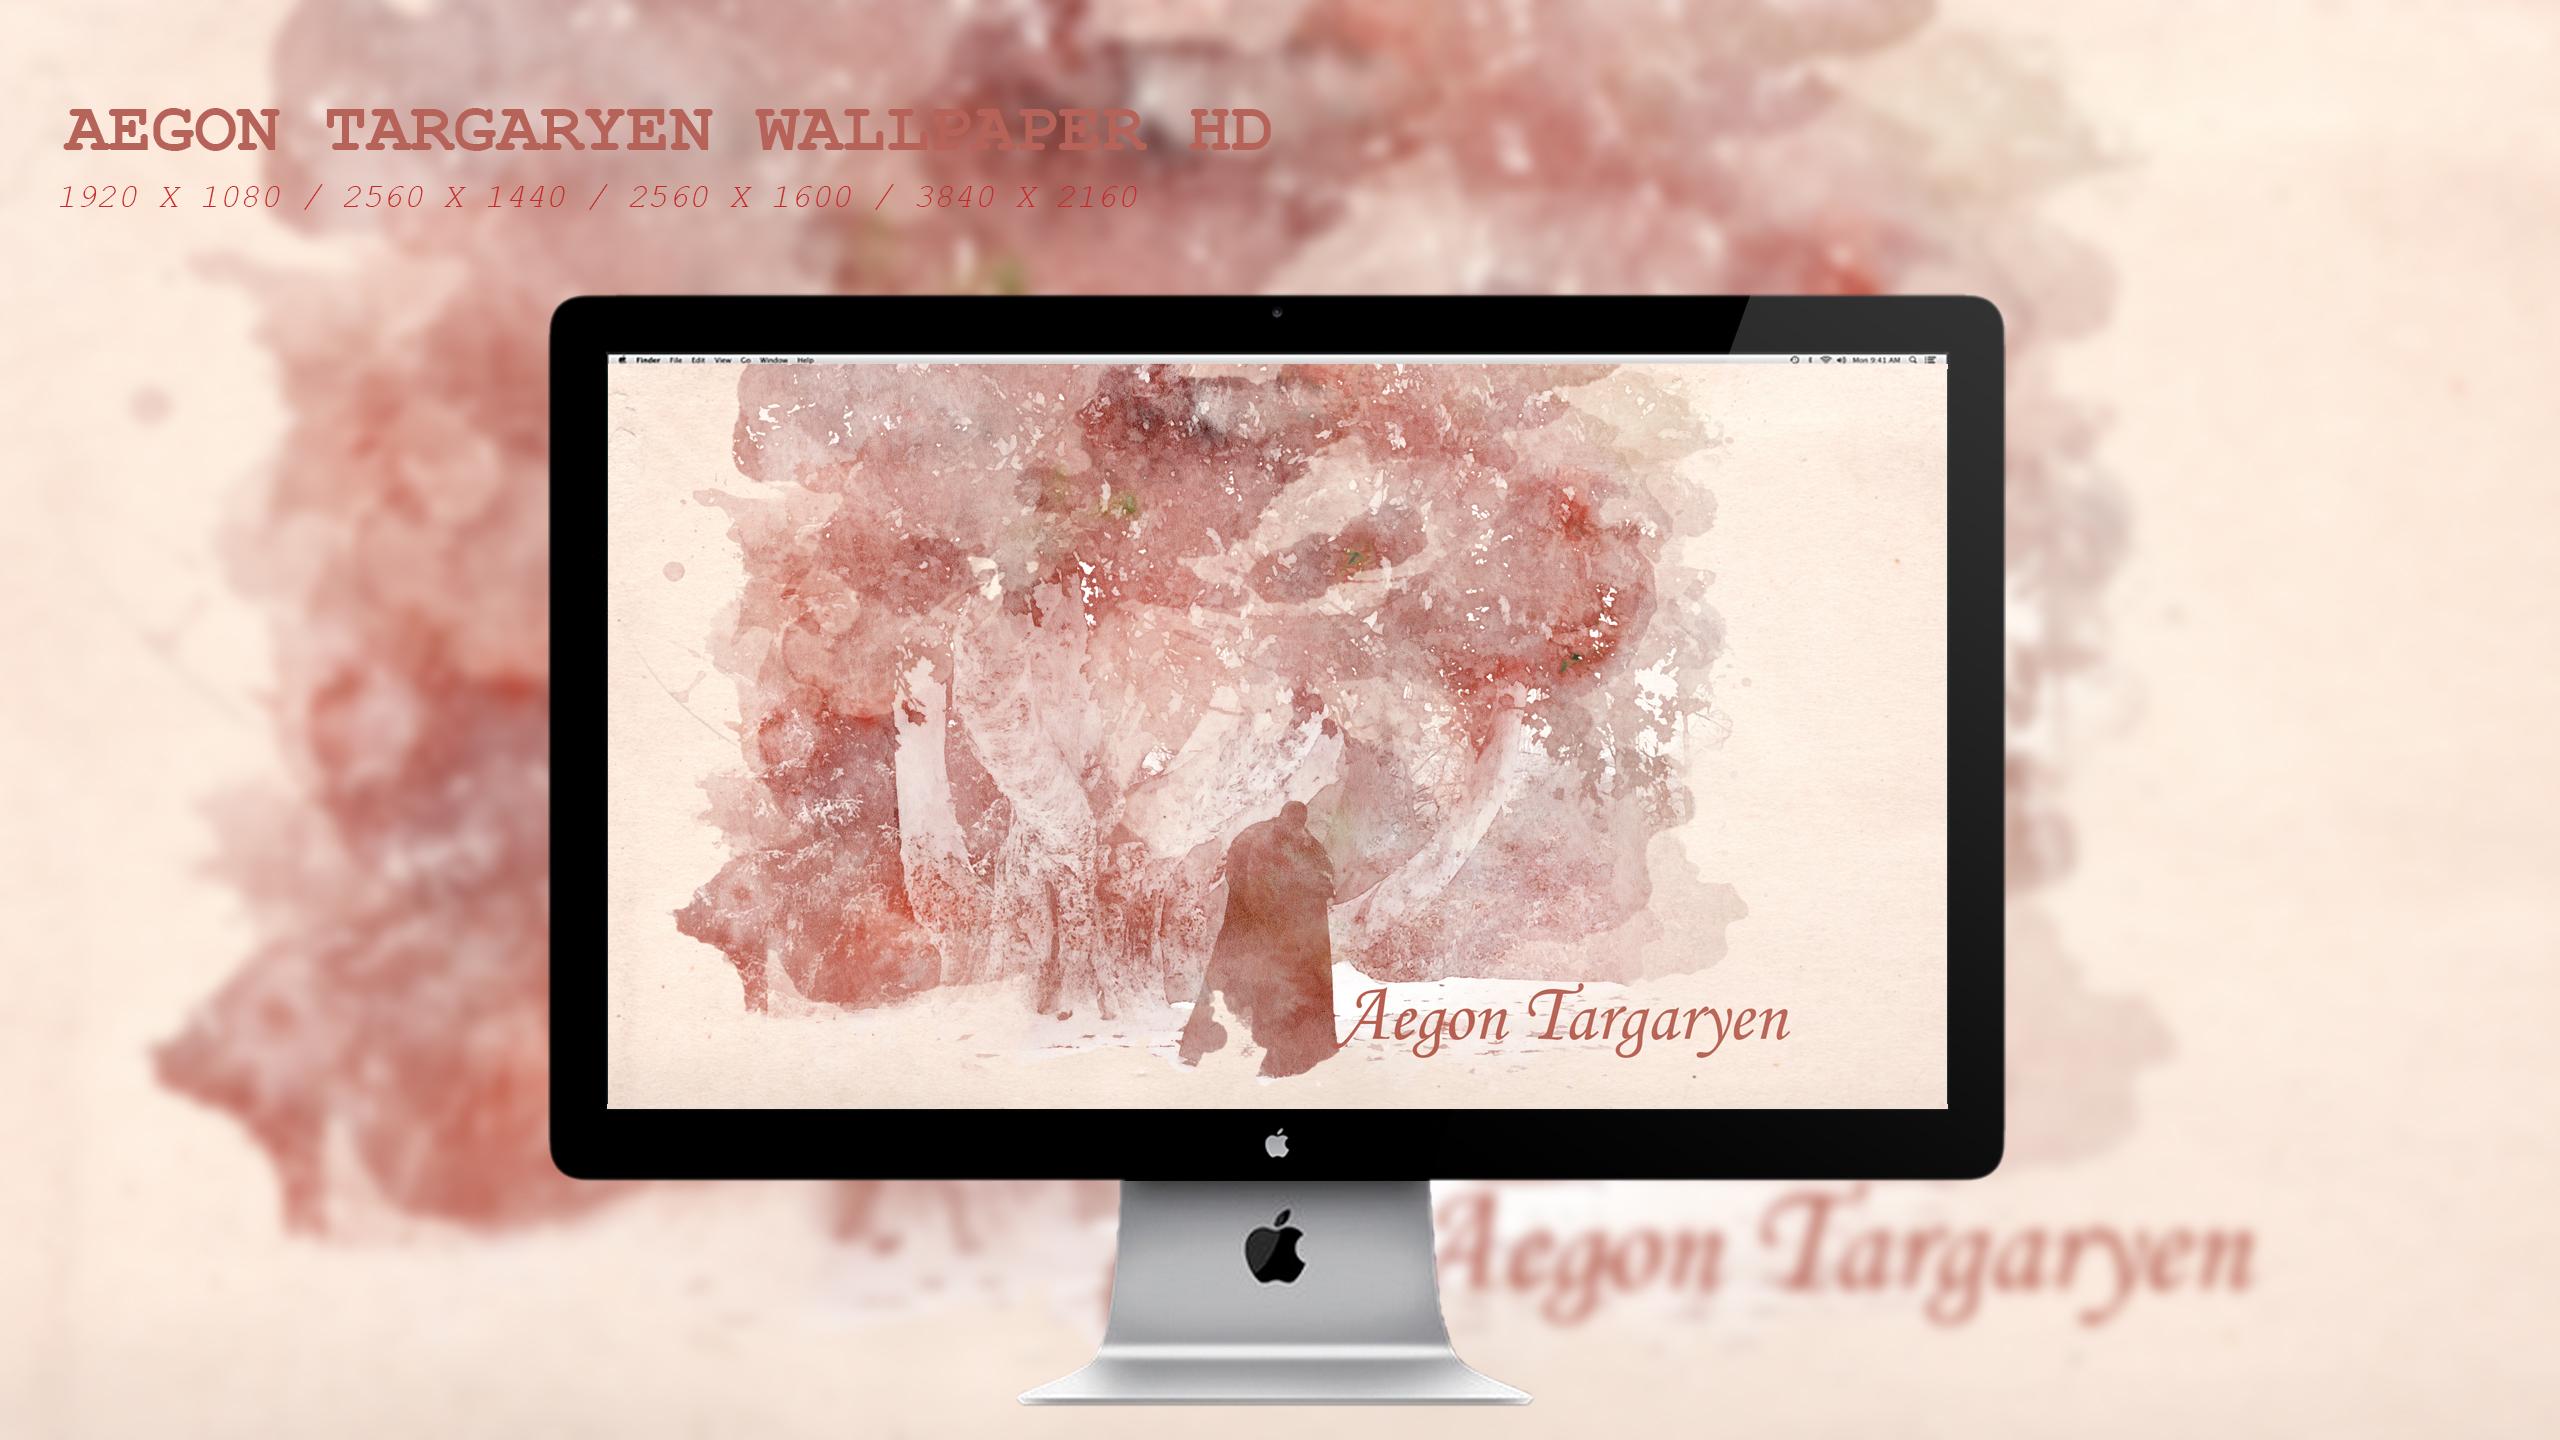 Aegon Targaryen Wallpaper HD